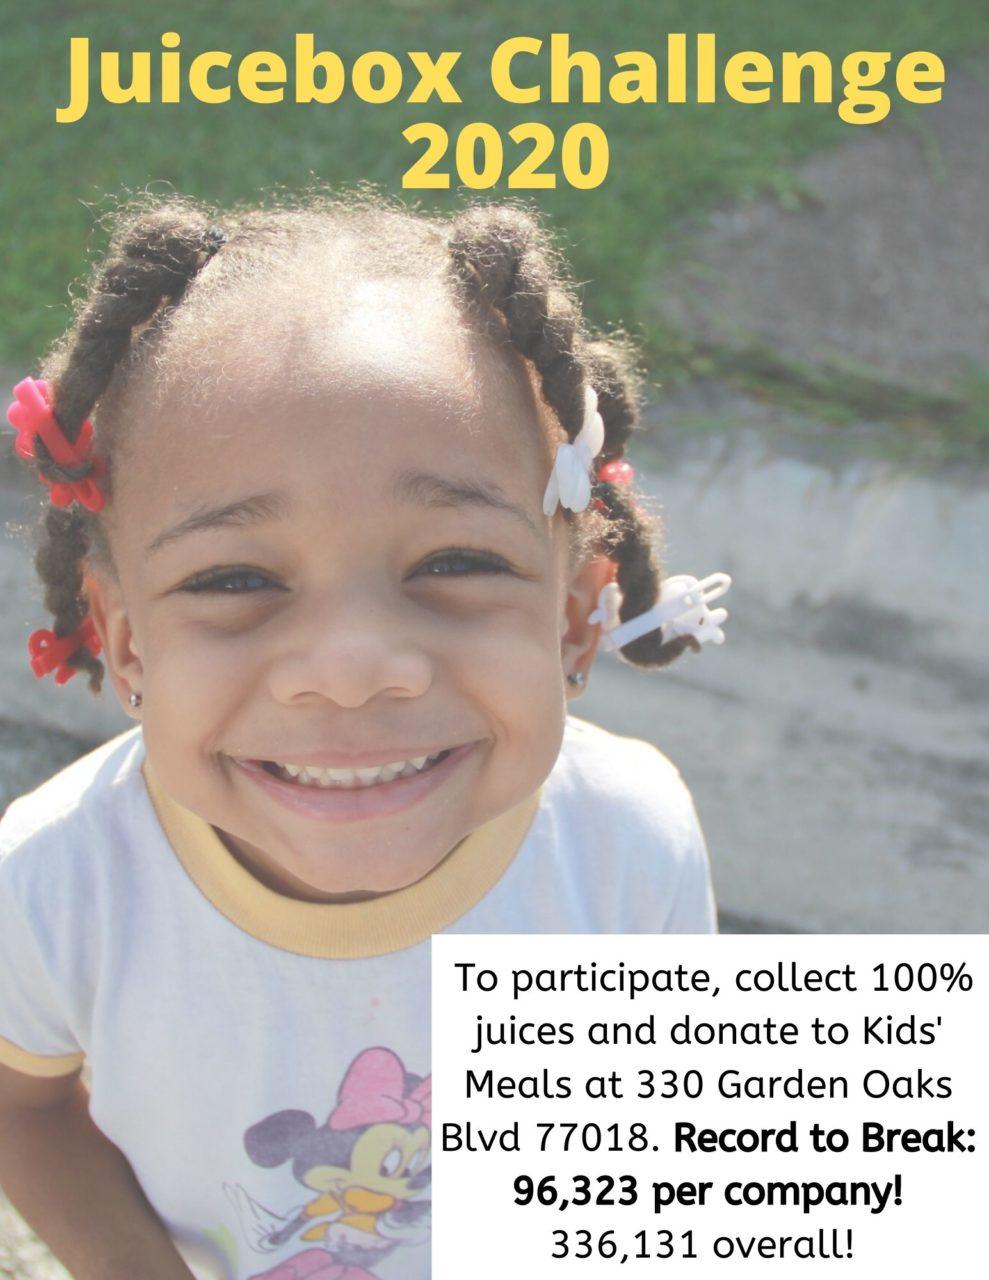 Juicebox Challenge 2020!